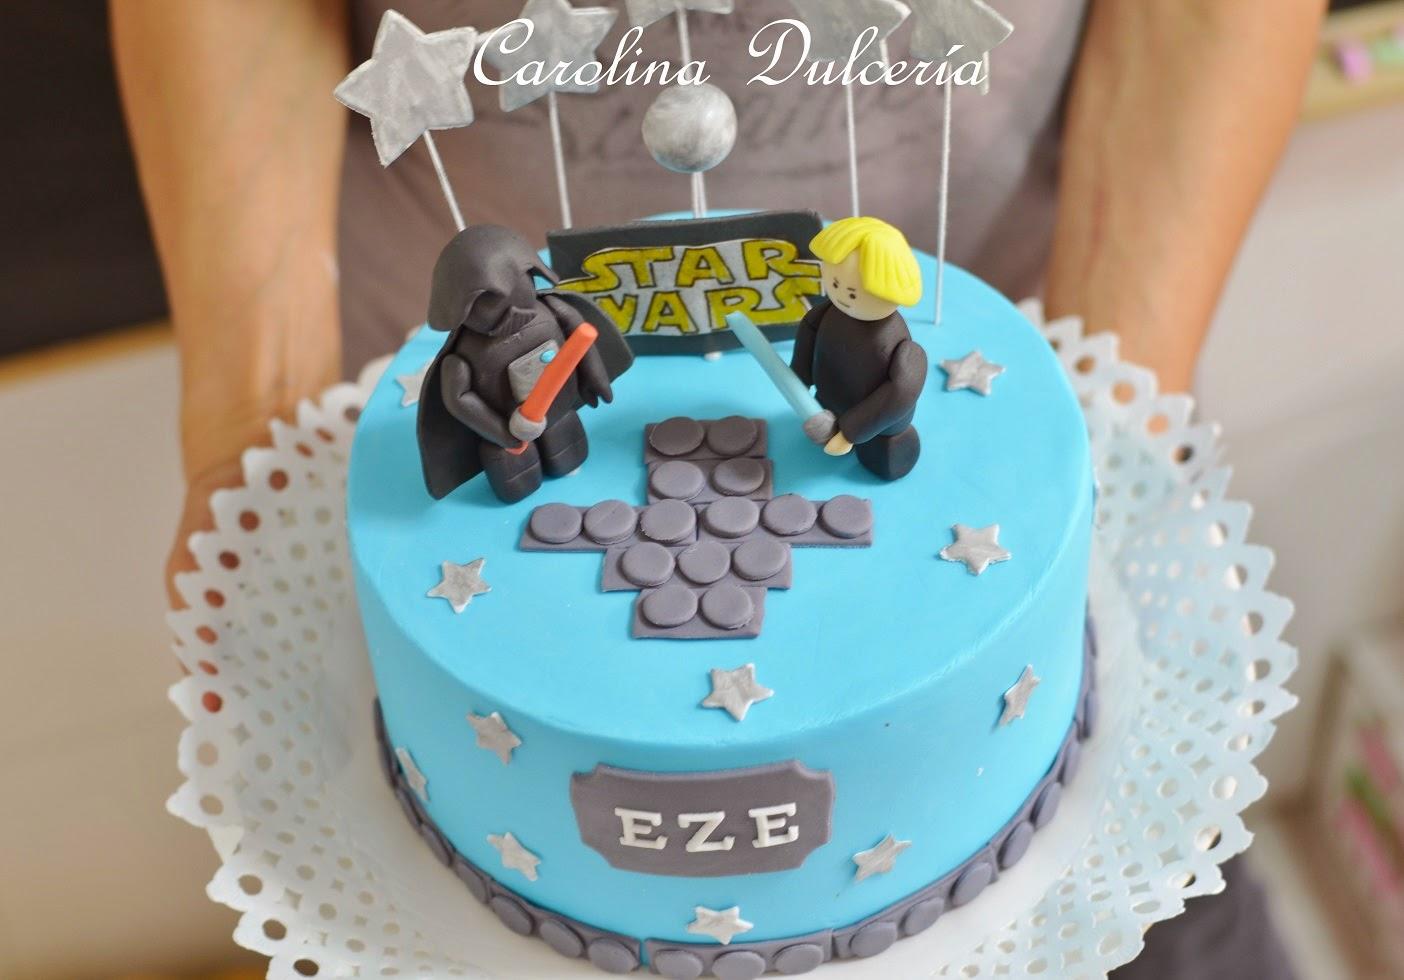 Célèbre Carolina Dulcería : Torta Star Wars Lego JP71